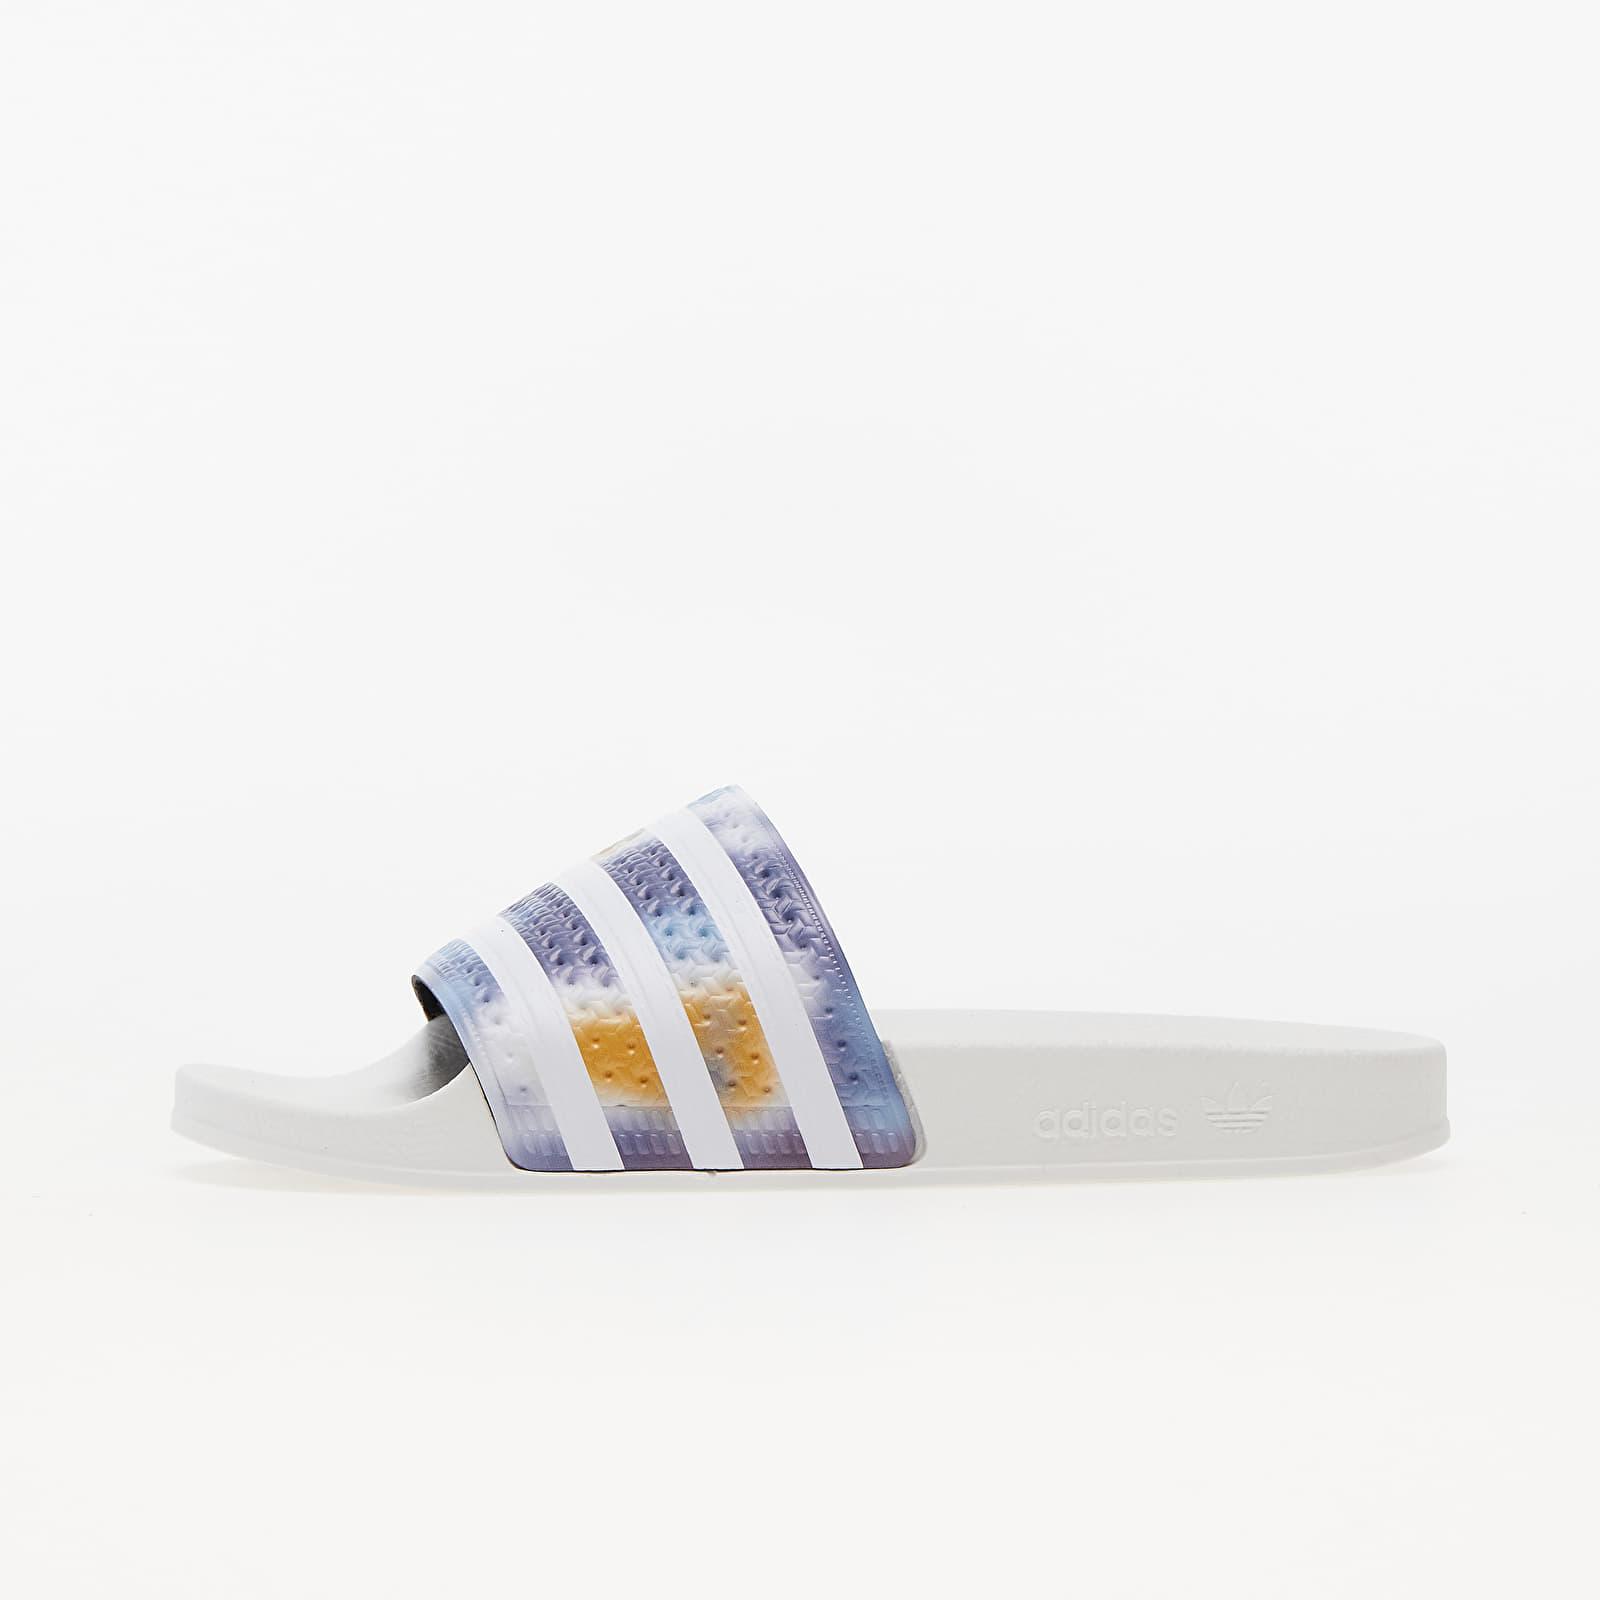 adidas Adilette W Ftw White/ Ftw White/ Sonink EUR 42